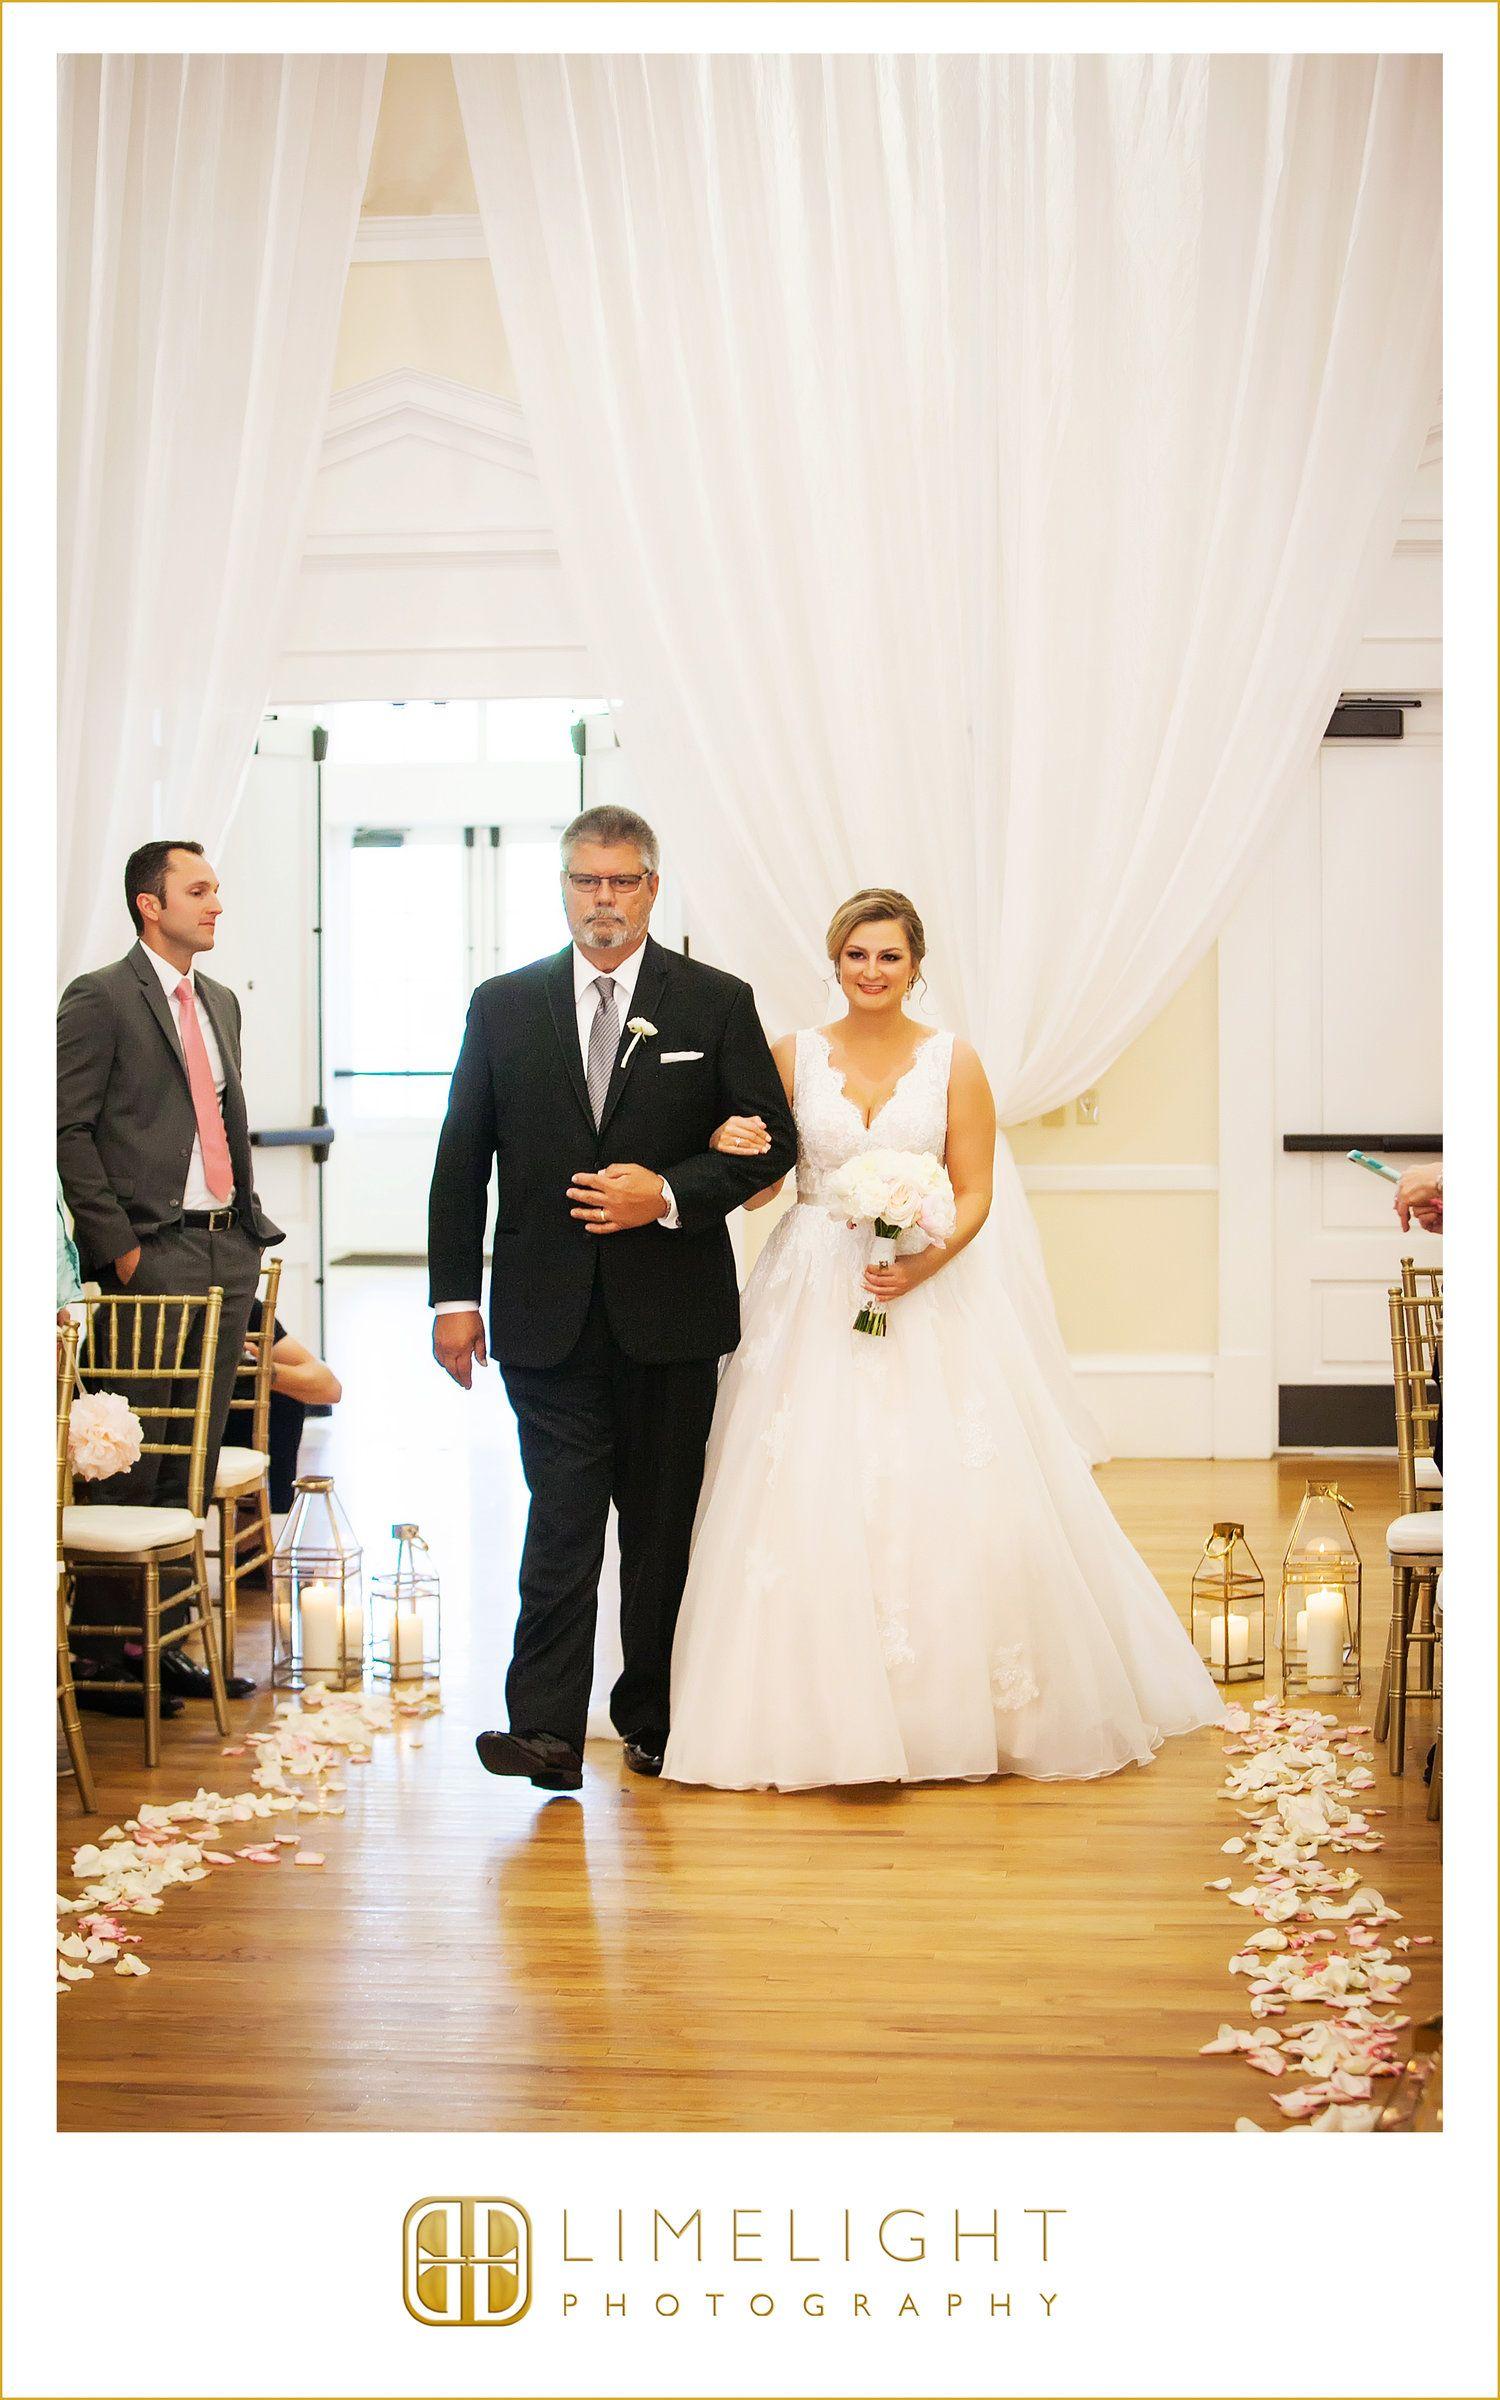 #wedding #photography #weddingphotography #TheRegent #Tampa #Florida #stepintothelimelight #limelightphotography #mr #mrs #newlyweds #tohaveandtohold #bride #groom #weddingday #weddedbliss #floridawedding #blush #gold #details #fatherofthebride #herecomesthebride #anticpation #drapery #flowerpetals